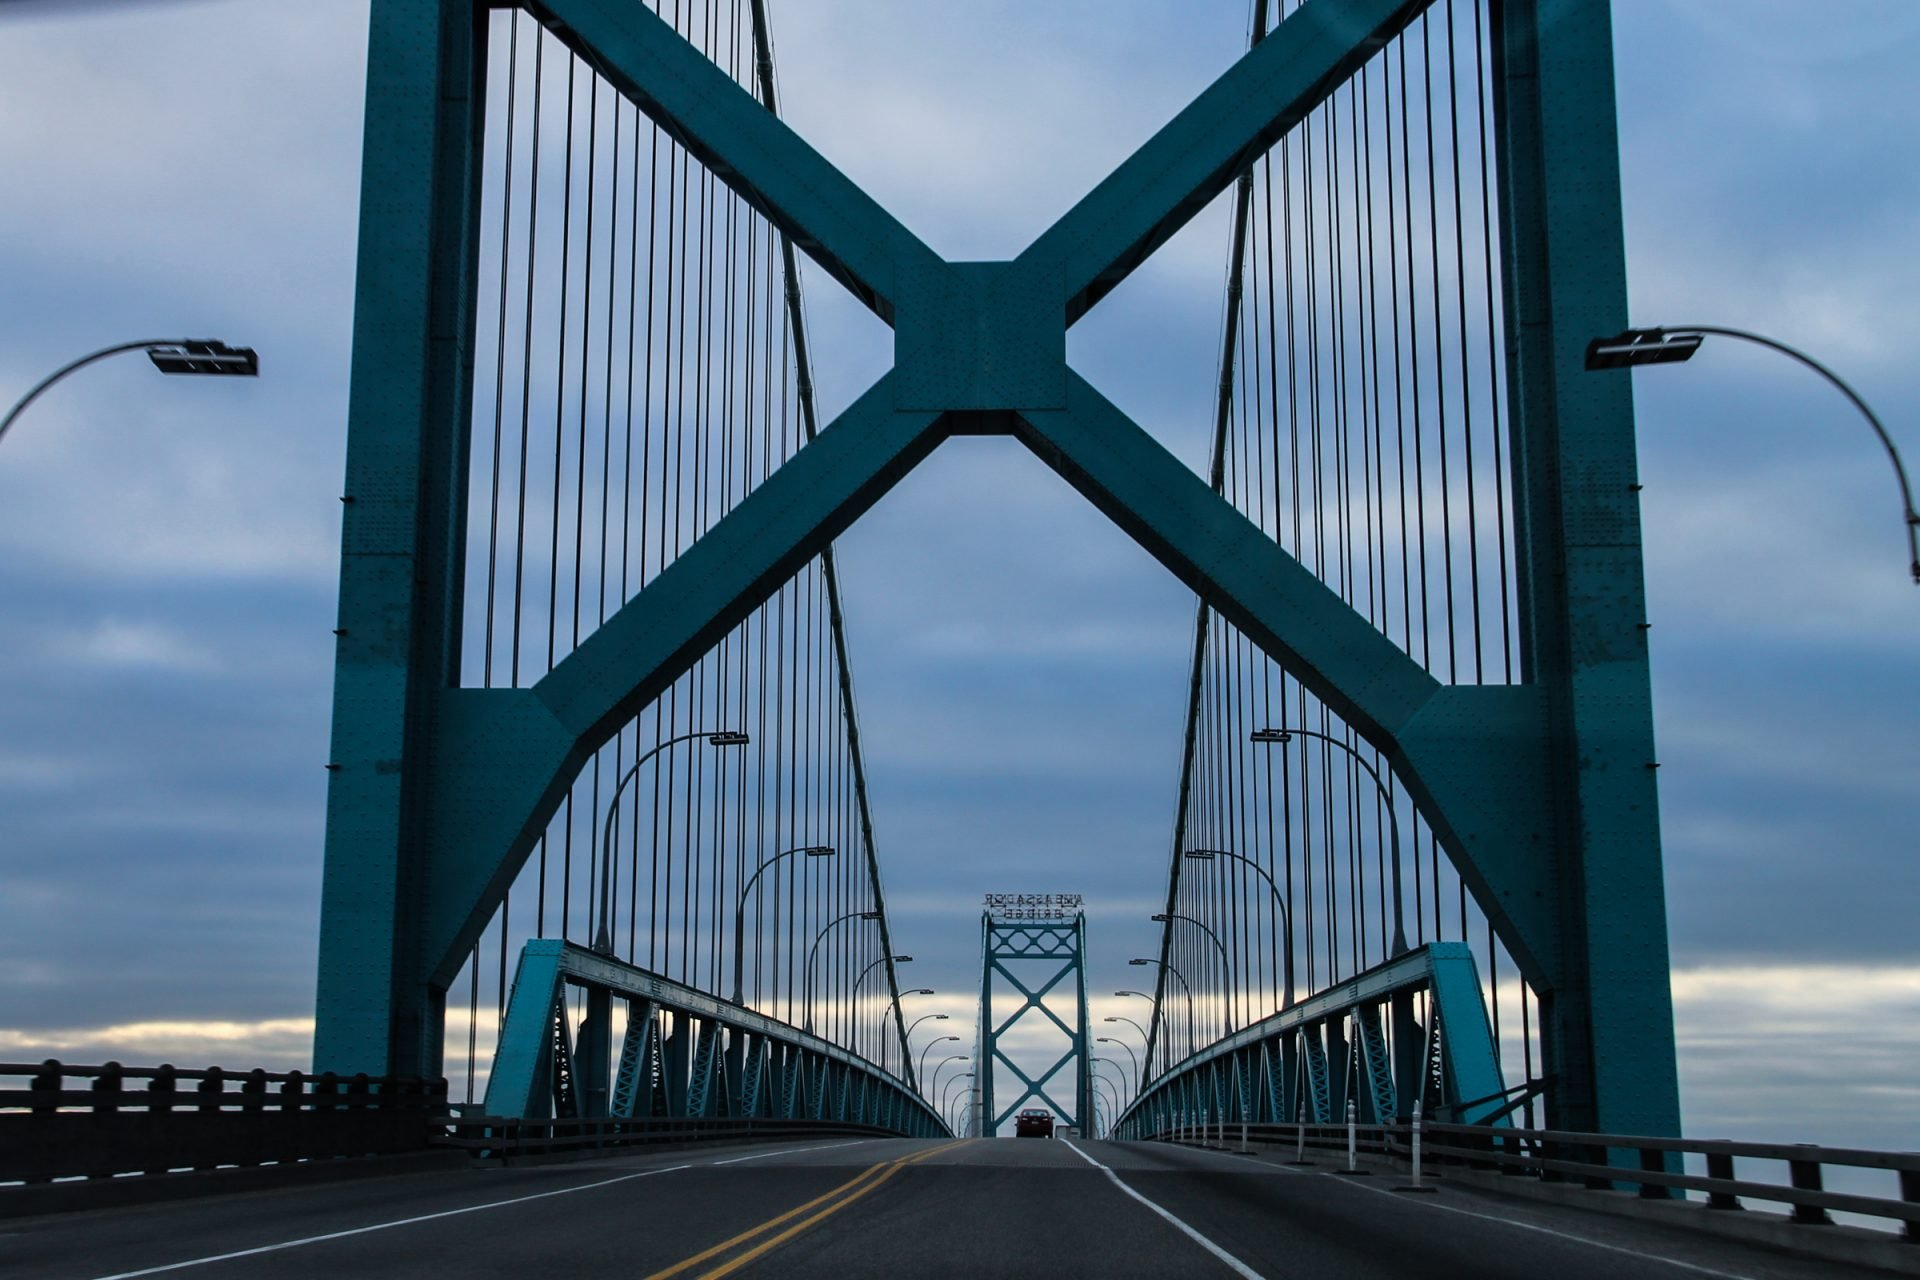 Blue Steel Bridge on Cloudy Day